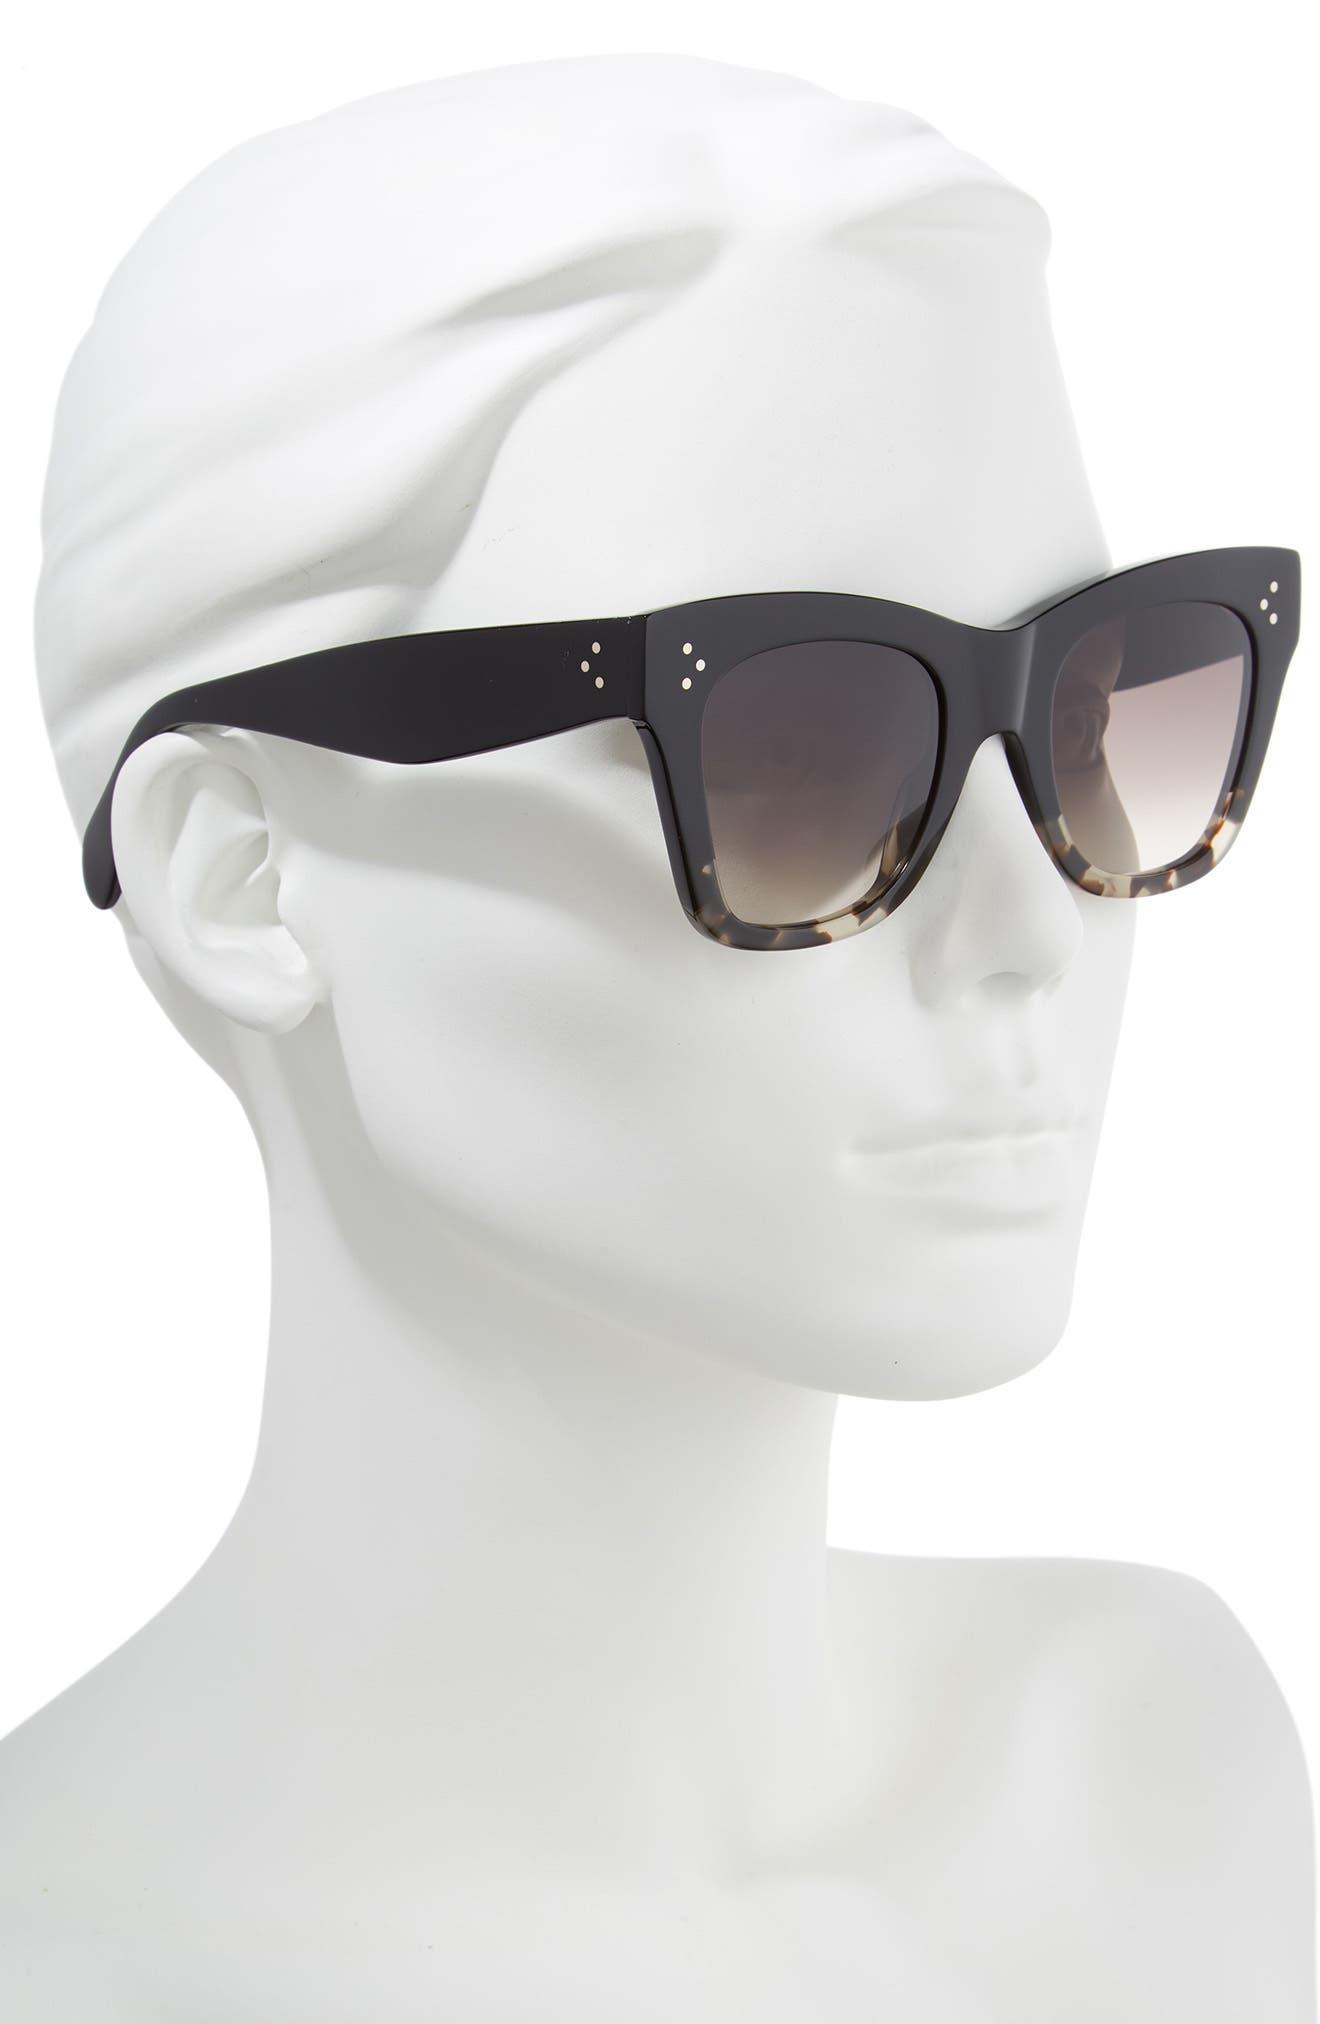 CELINE, 50mm Gradient Butterfly Sunglasses, Alternate thumbnail 3, color, BLACK/ GREY HAVANA/ BROWN